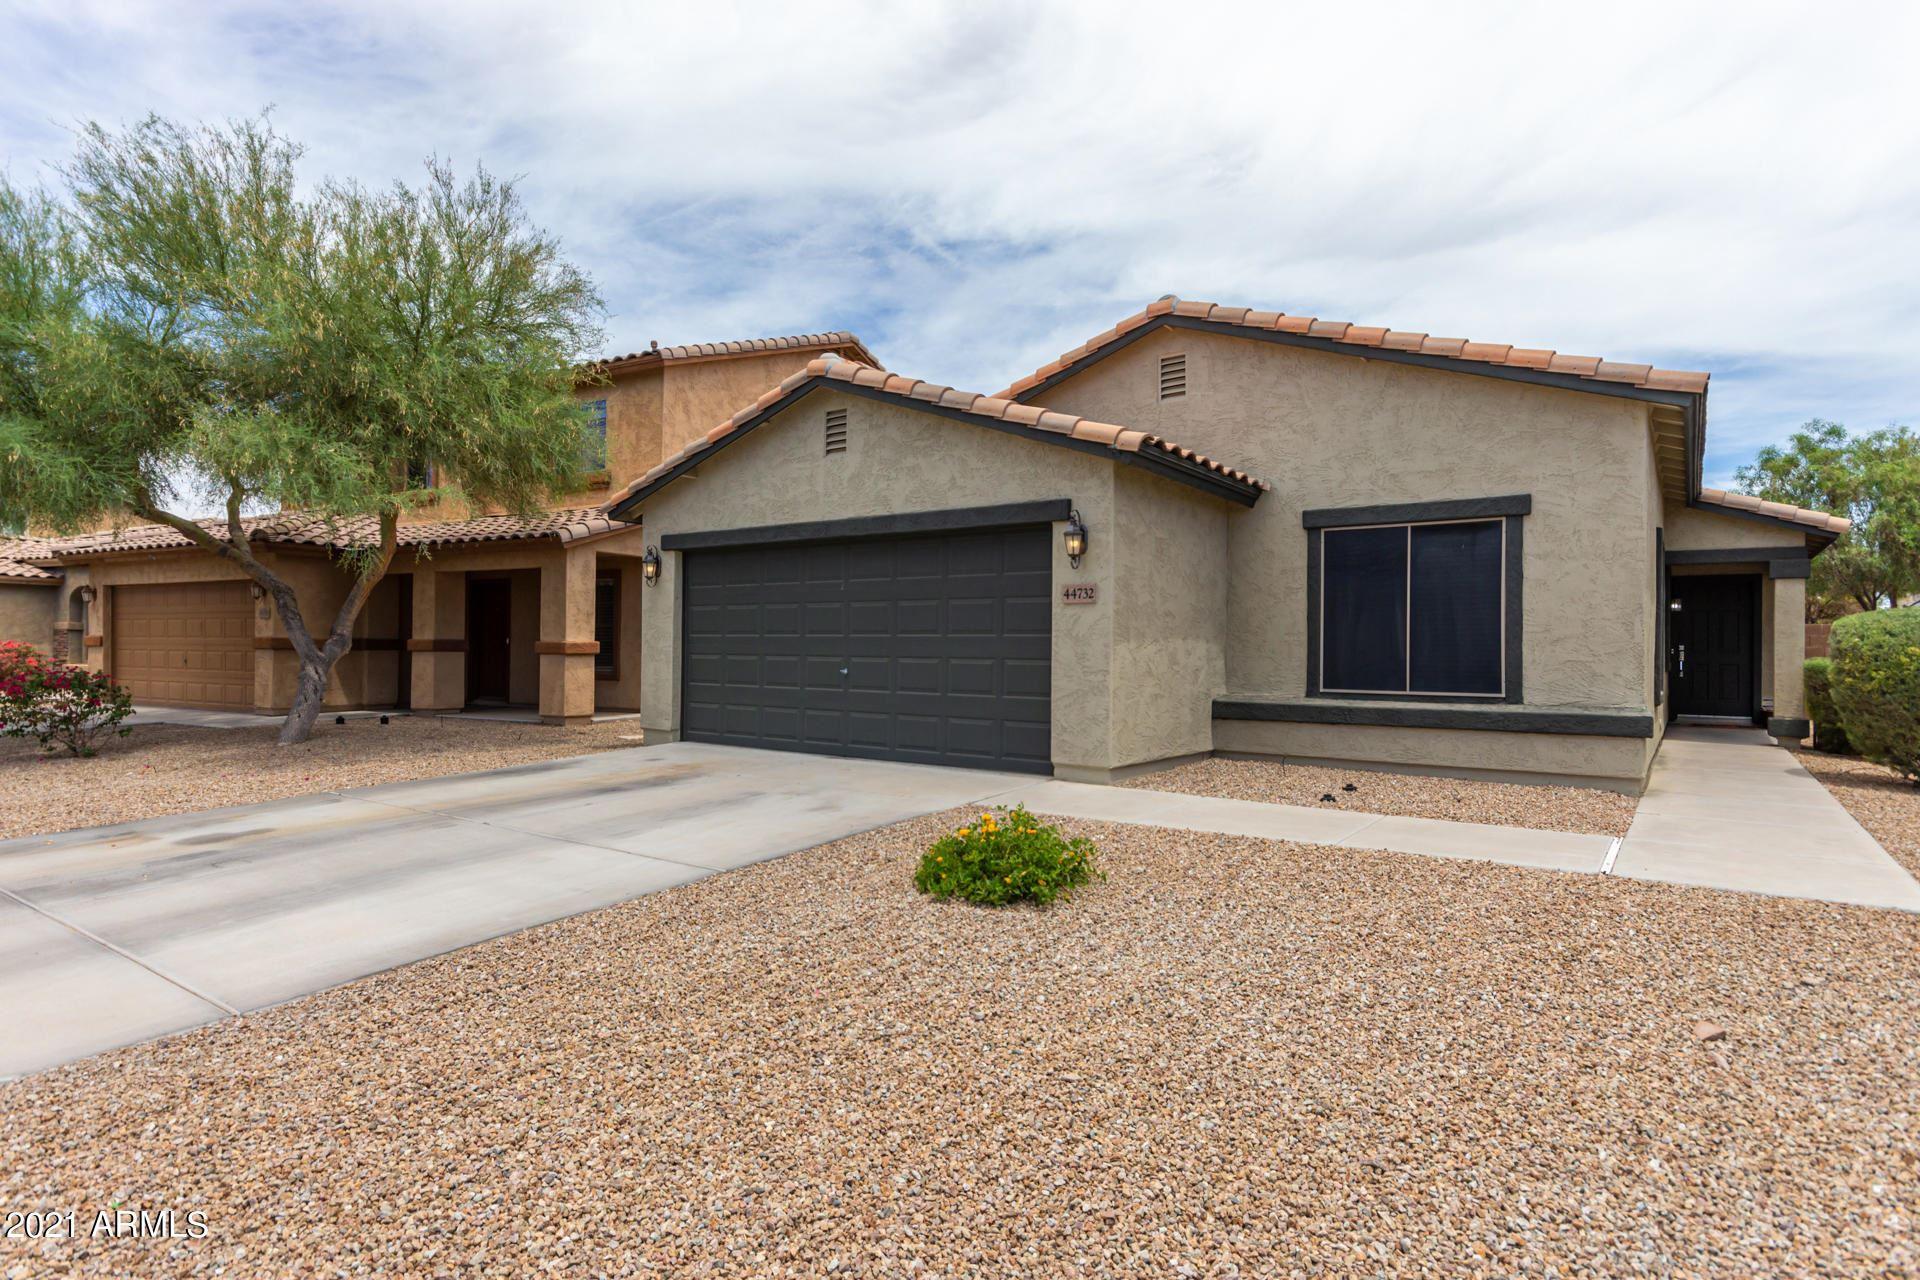 Photo of 44732 W BALBOA Drive, Maricopa, AZ 85139 (MLS # 6249182)